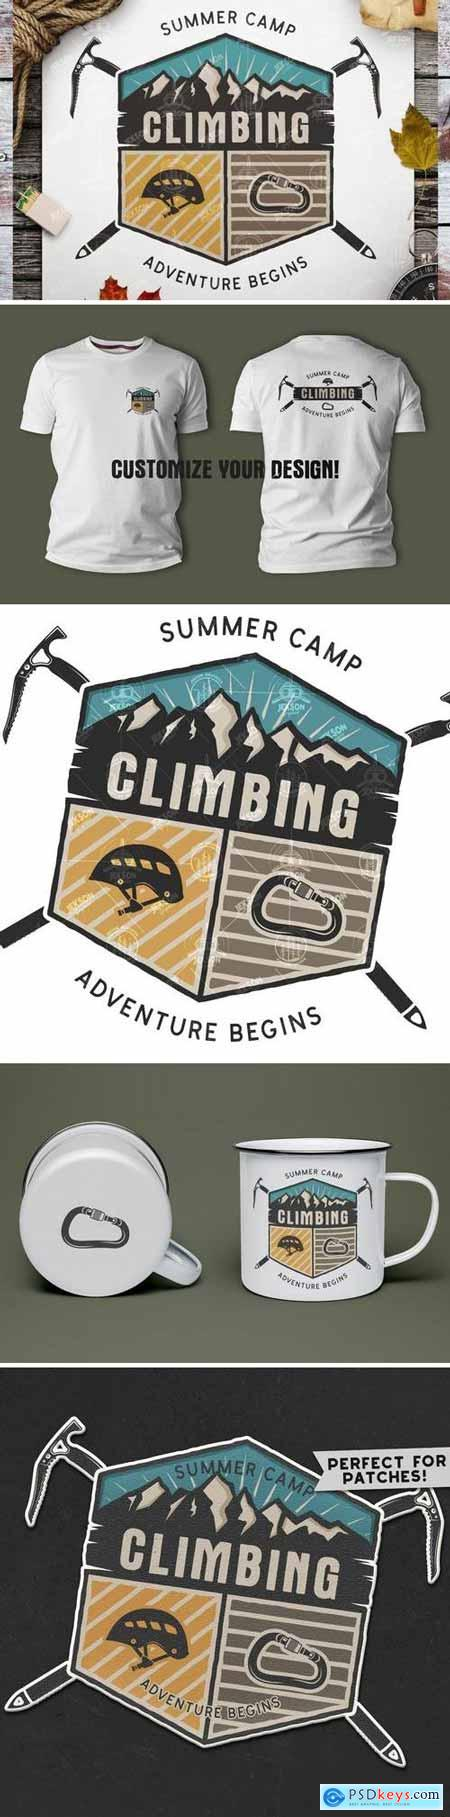 Travel Retro Badge Vintage Climbing Logo Patch